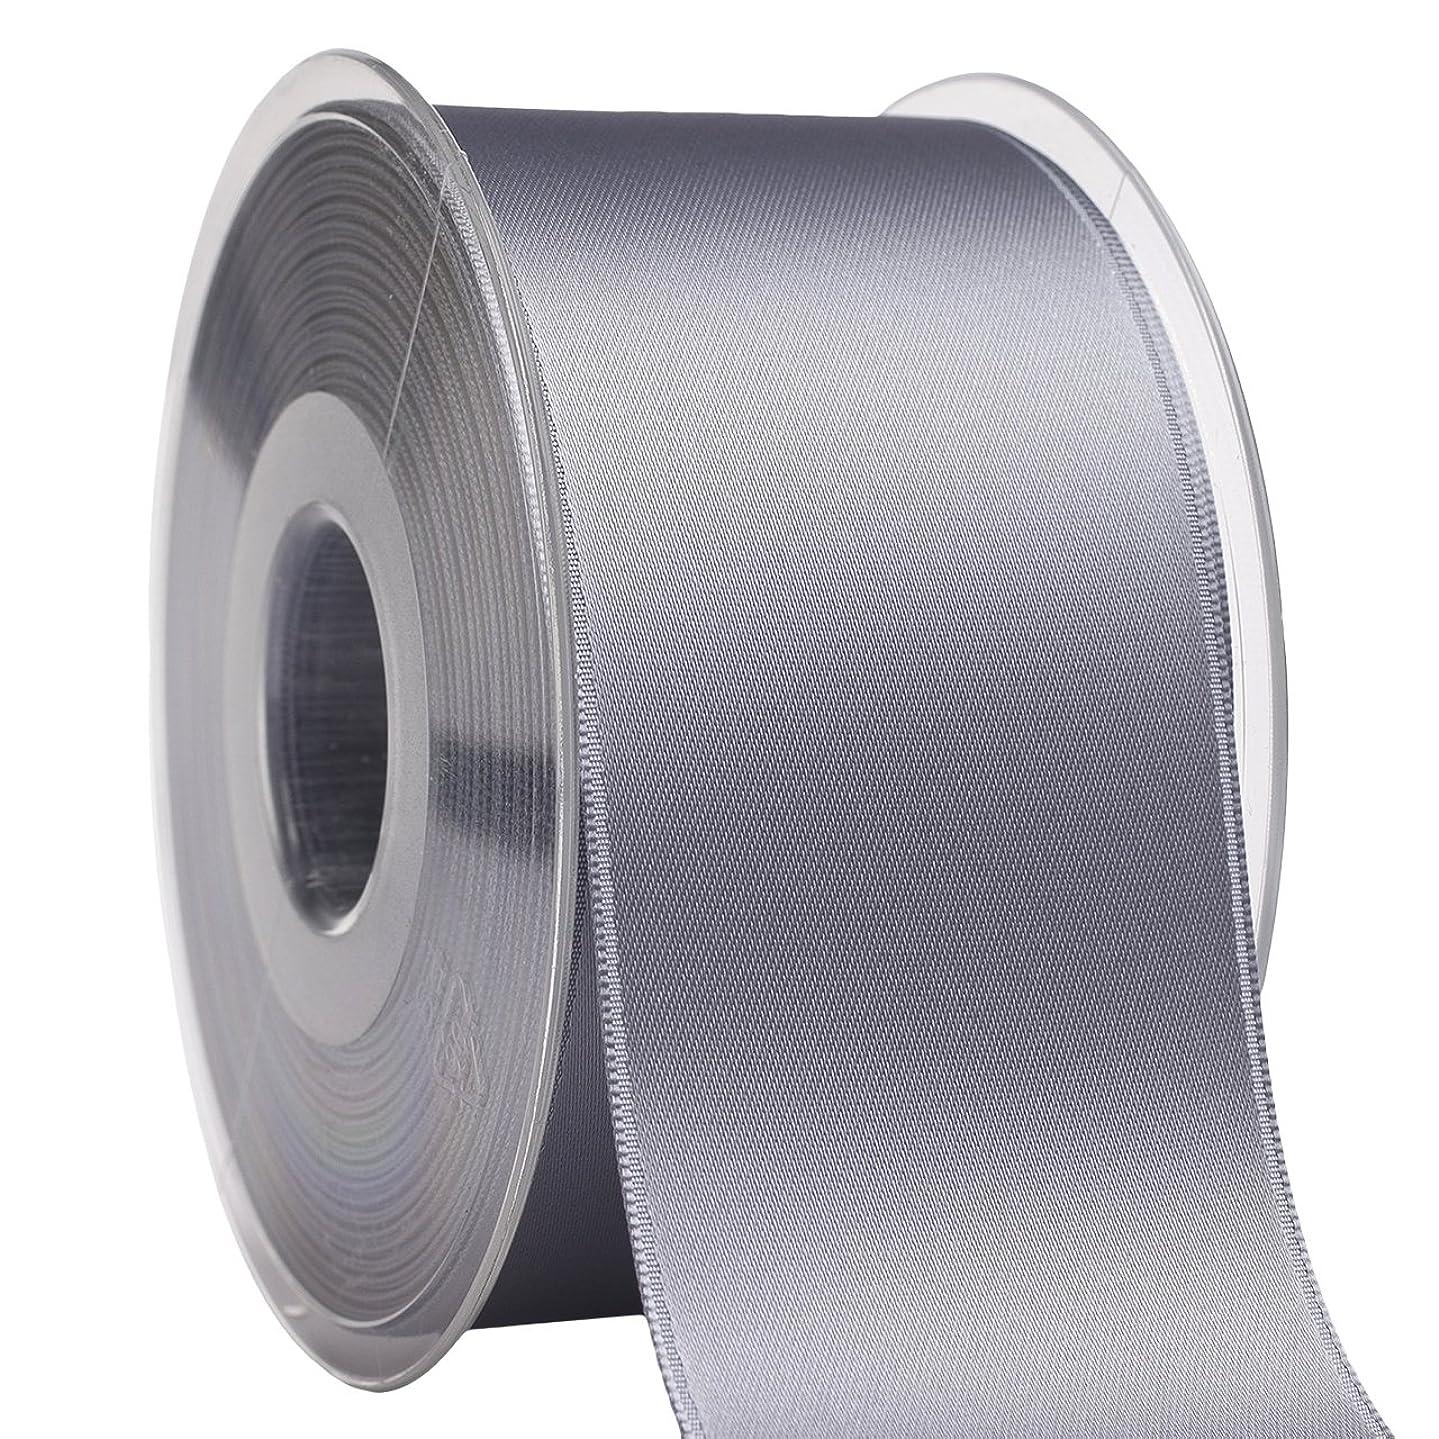 035 Swiss Satin 03550/25-036 Fabric Ribbon, 2